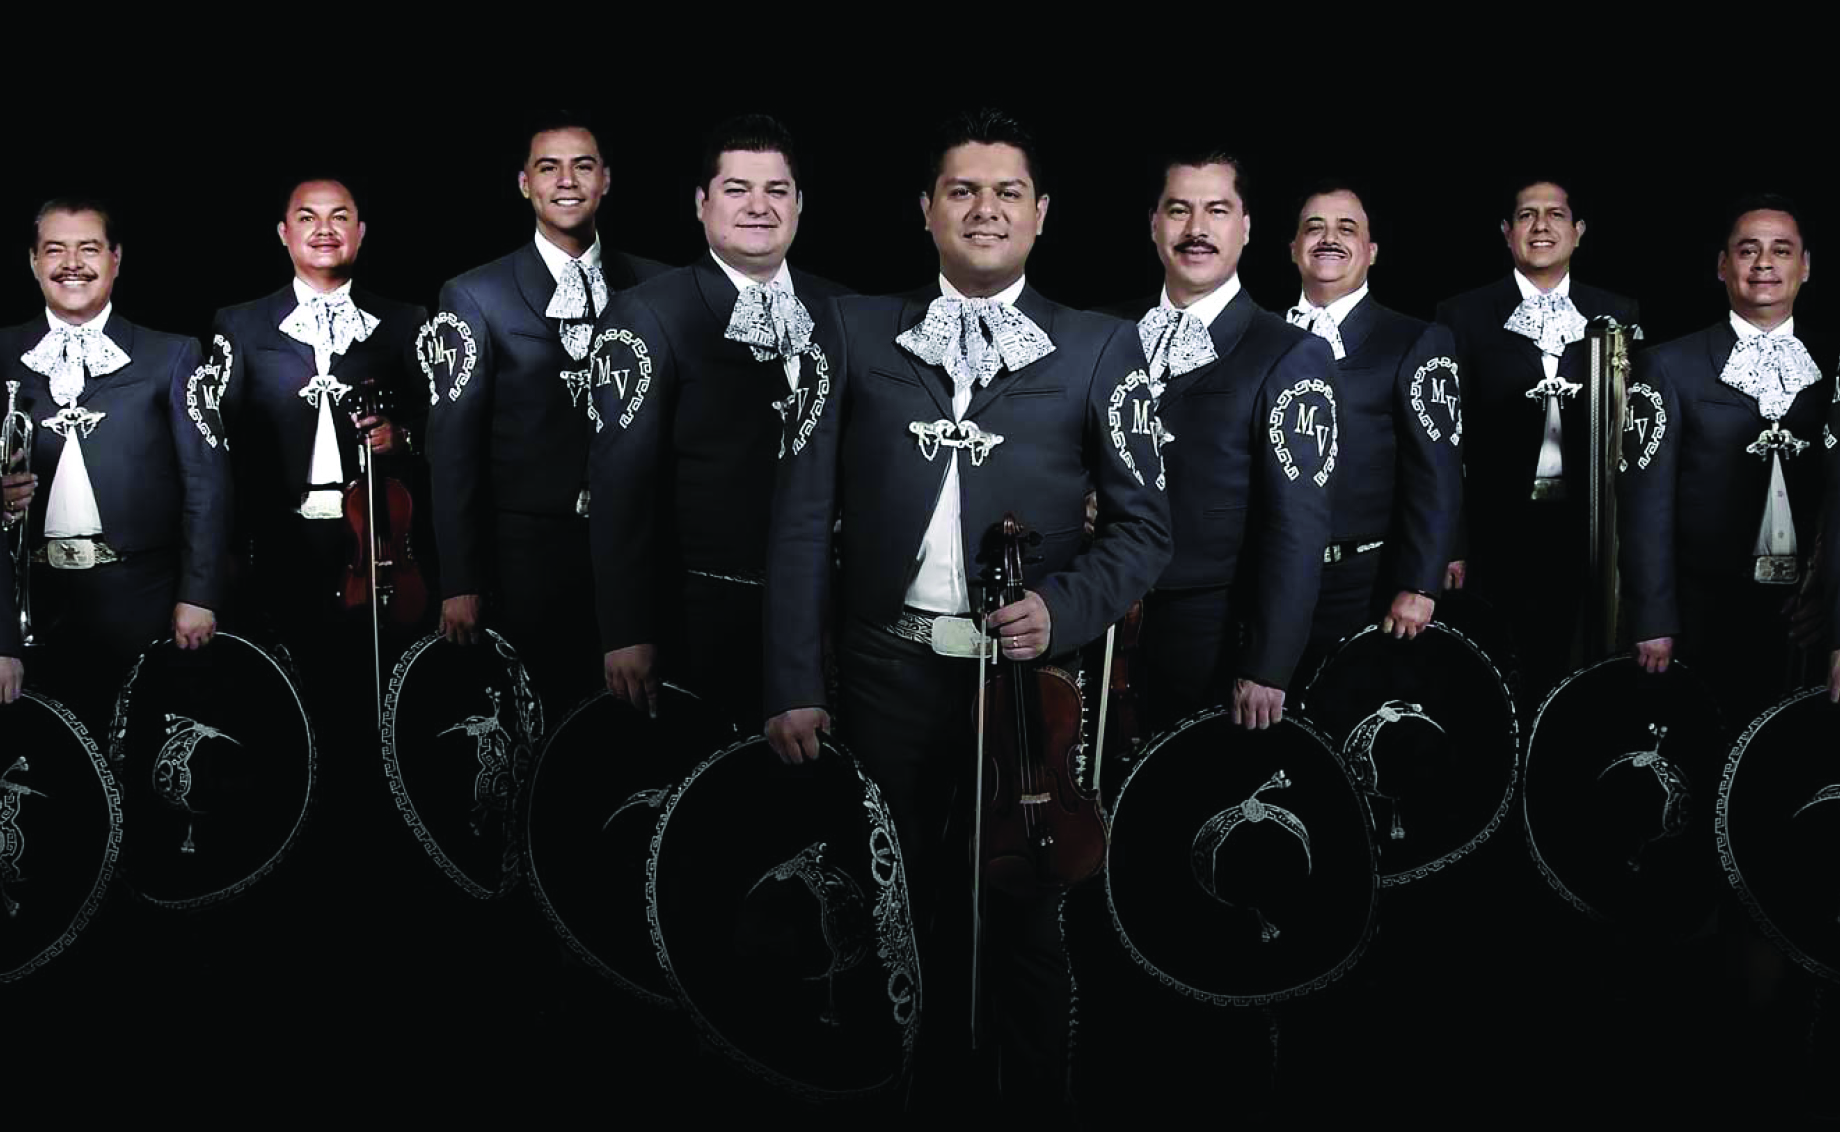 img-6423-mariachi-vargas-de-tecalitlan-920x566.jpg